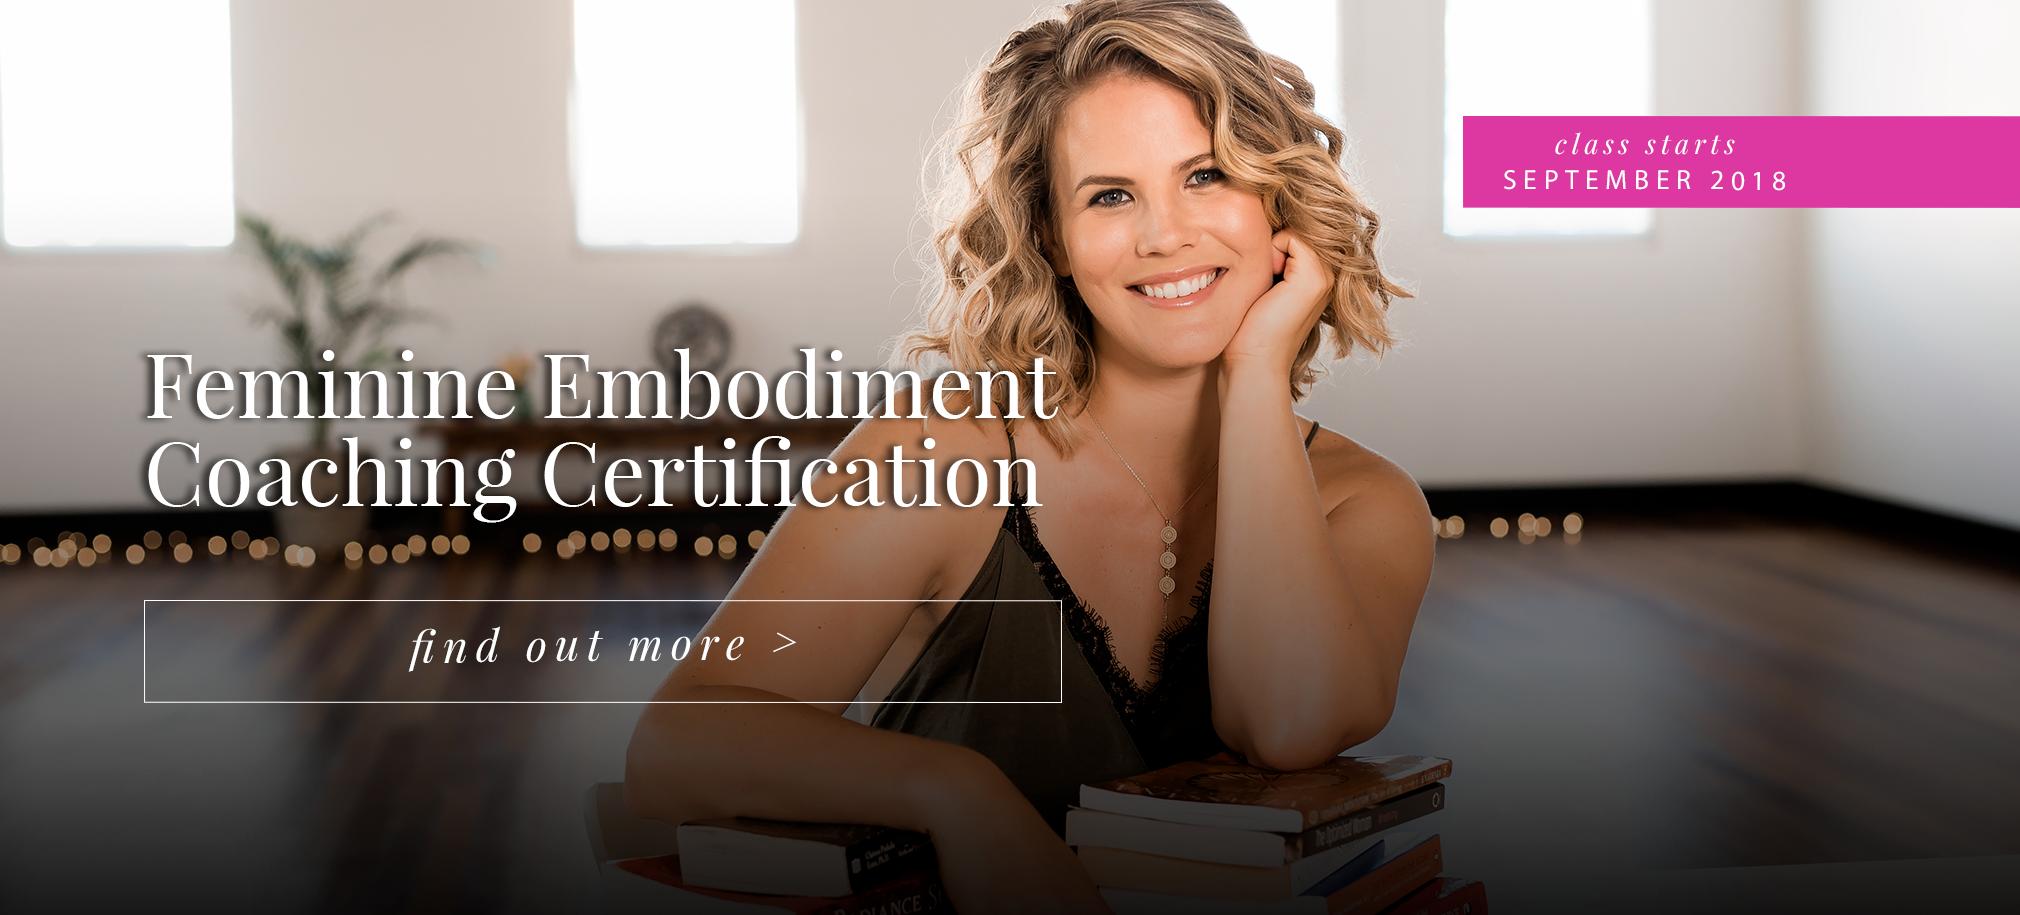 Feminine-Embodiment-Coaching-Enrollment-Open-School